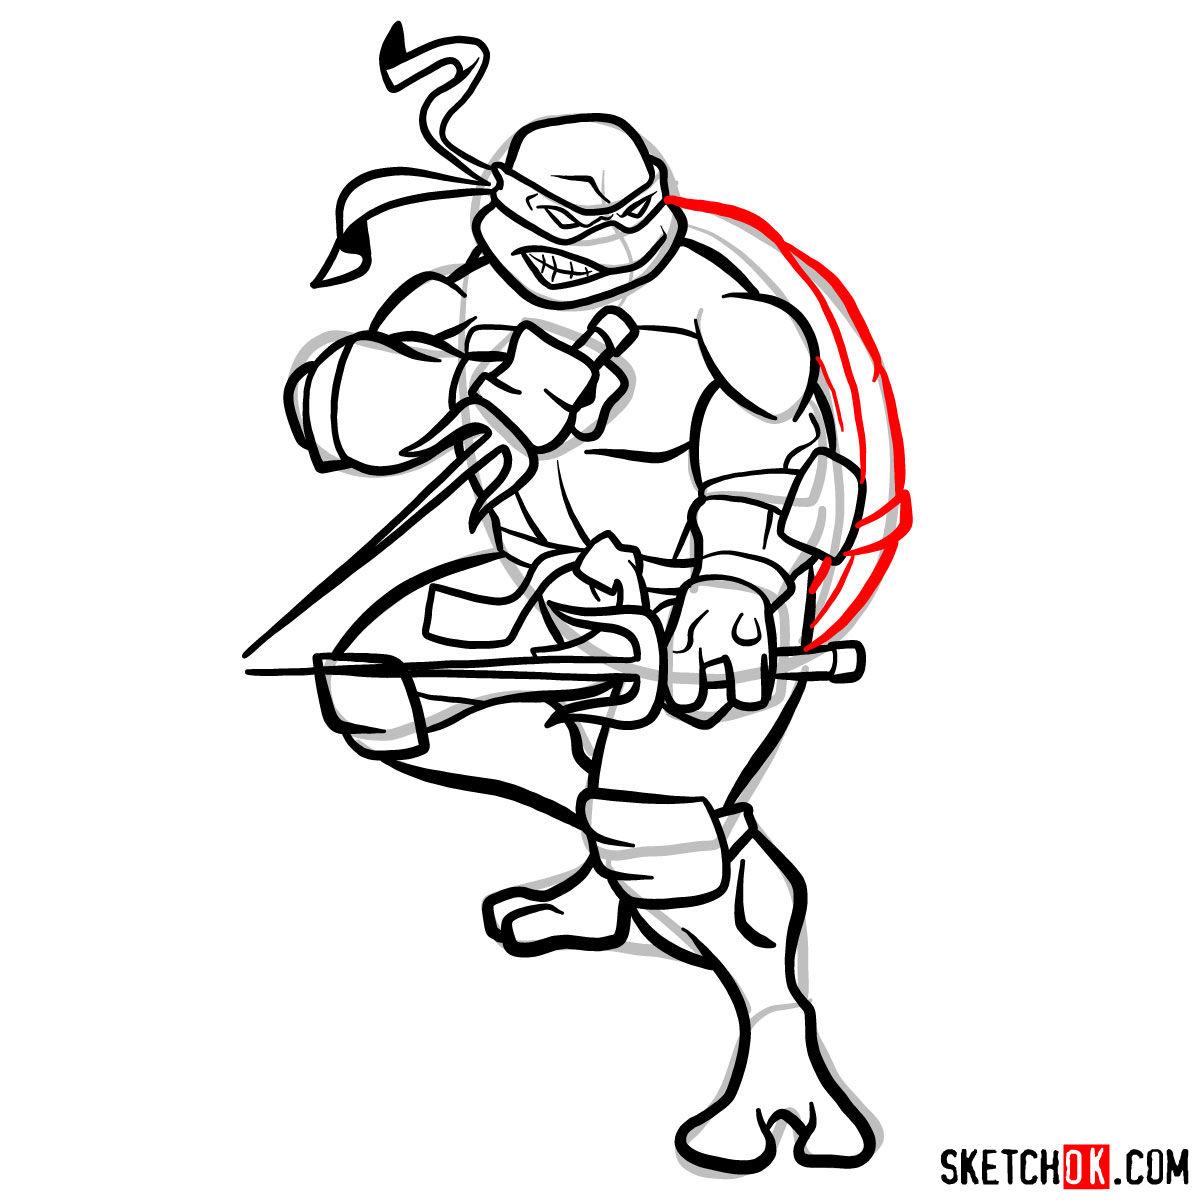 How to draw angry Raphael teenage mutant ninja turtle - step 13